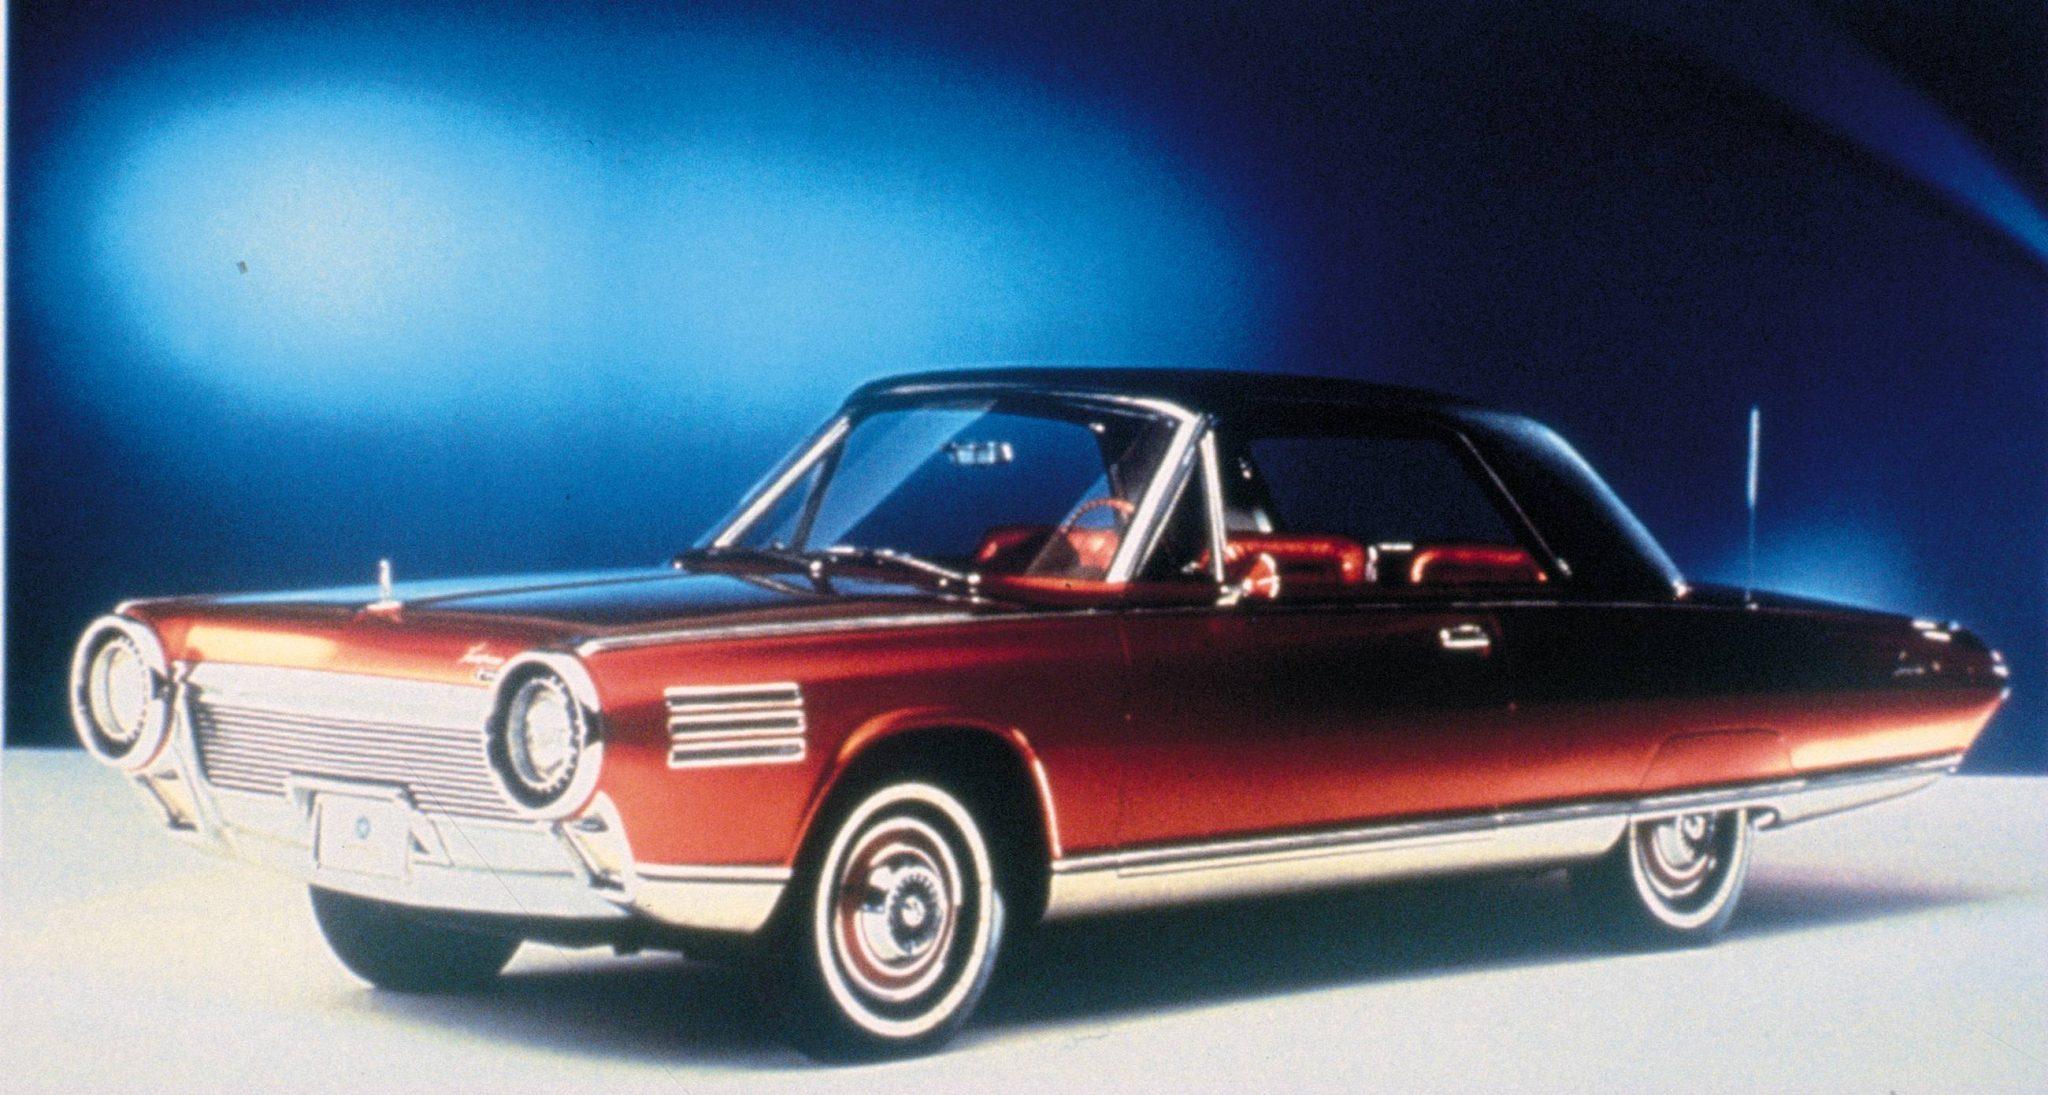 Chrysler Turbine (1963)